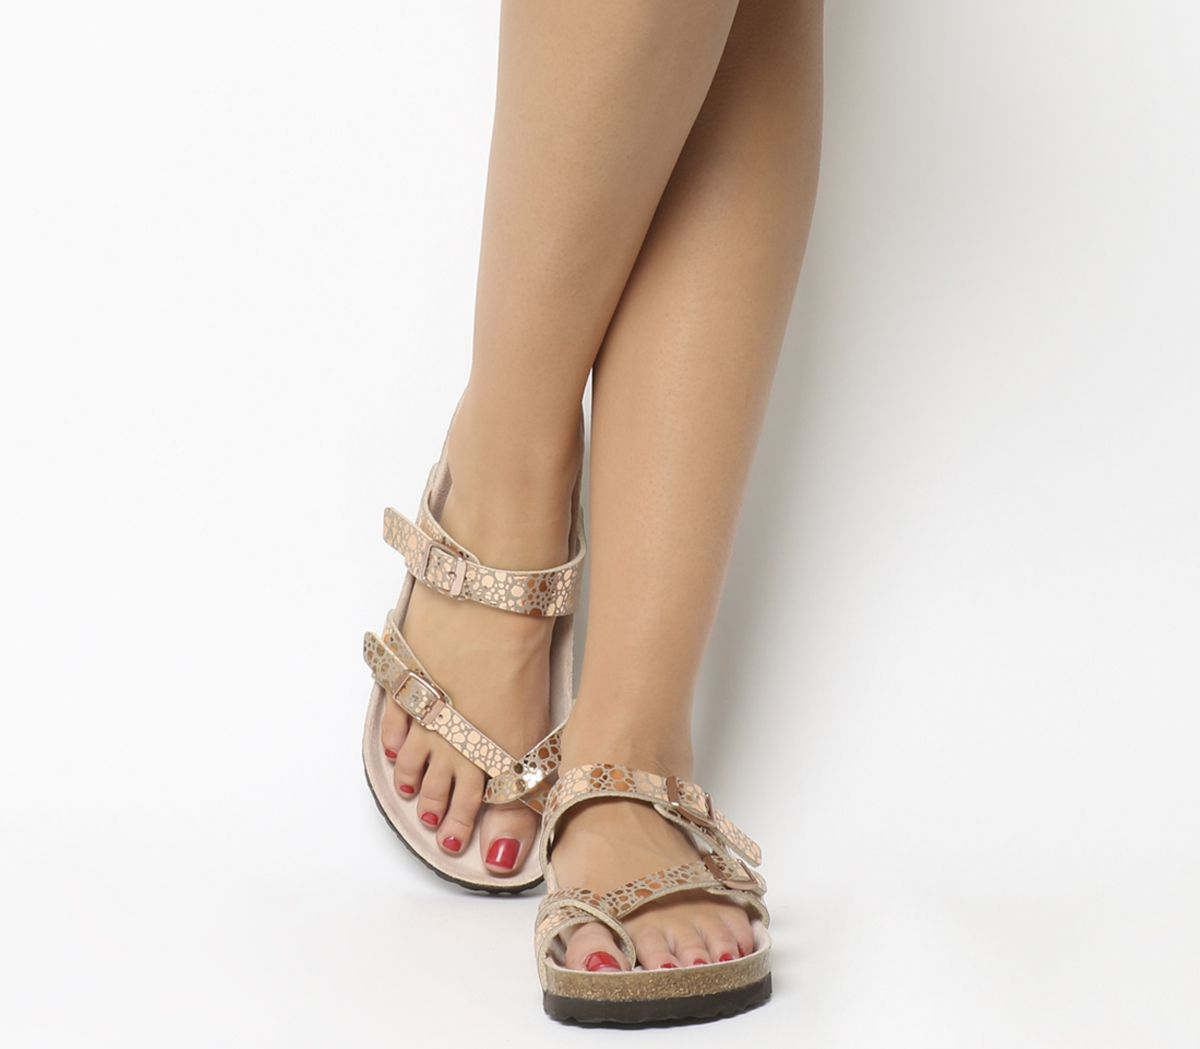 d401ce3fa5f0 Birkenstock Mayari Cross Strap Sandals Metallic Stones Copper - Sandals